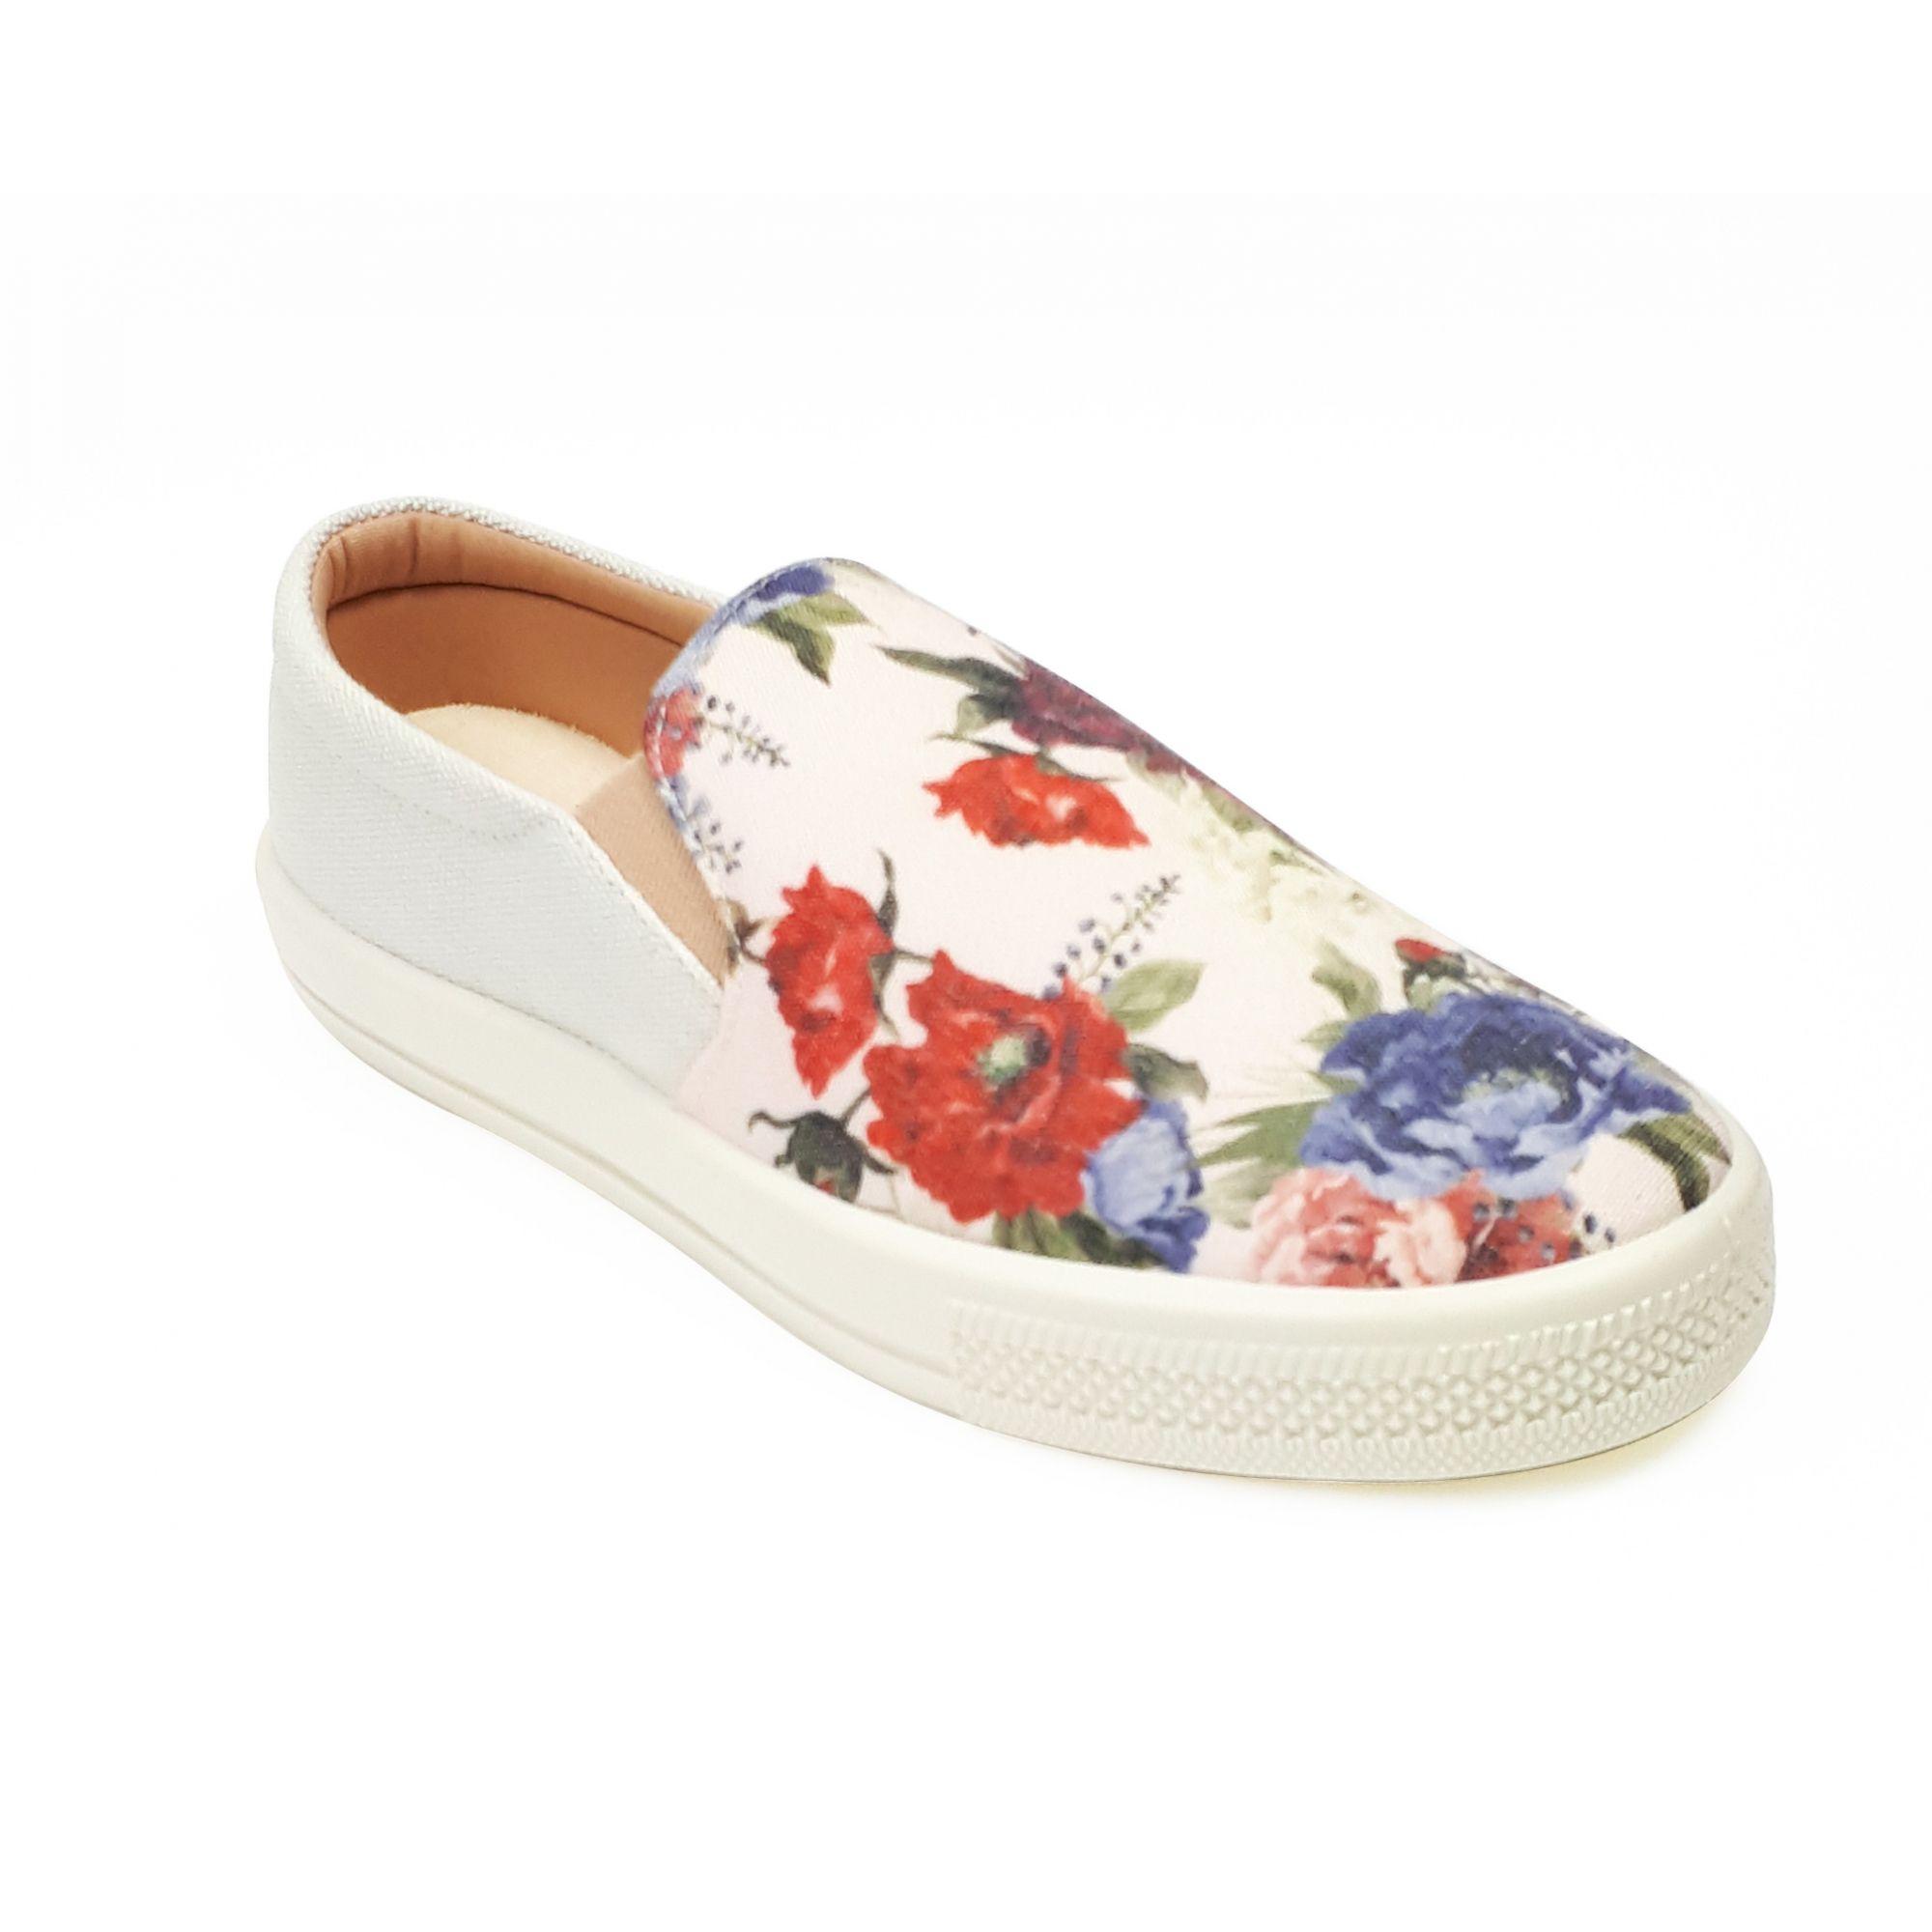 Tênis Milli slip on floral